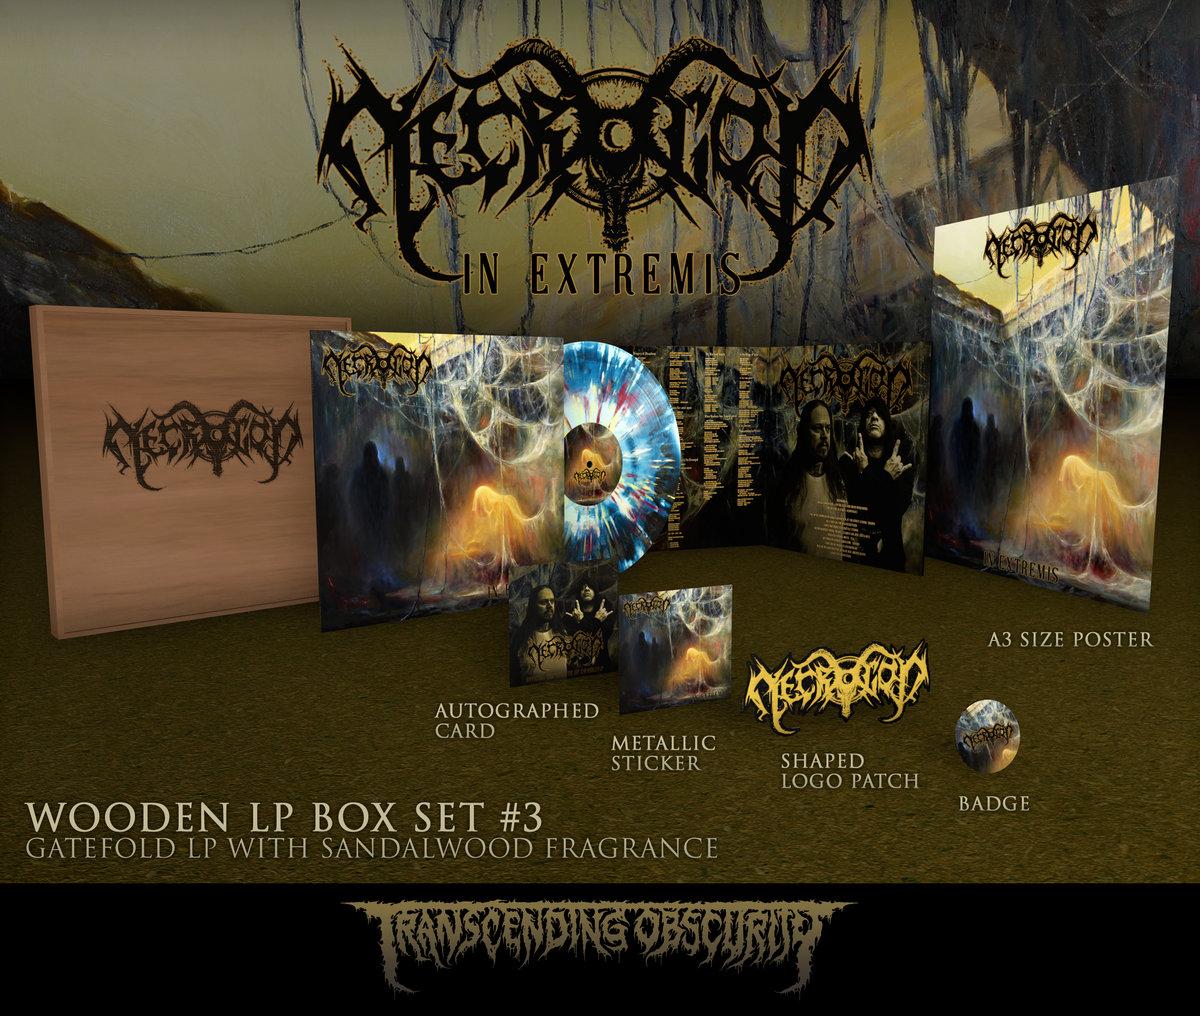 In Extremis Wooden LP Boxset